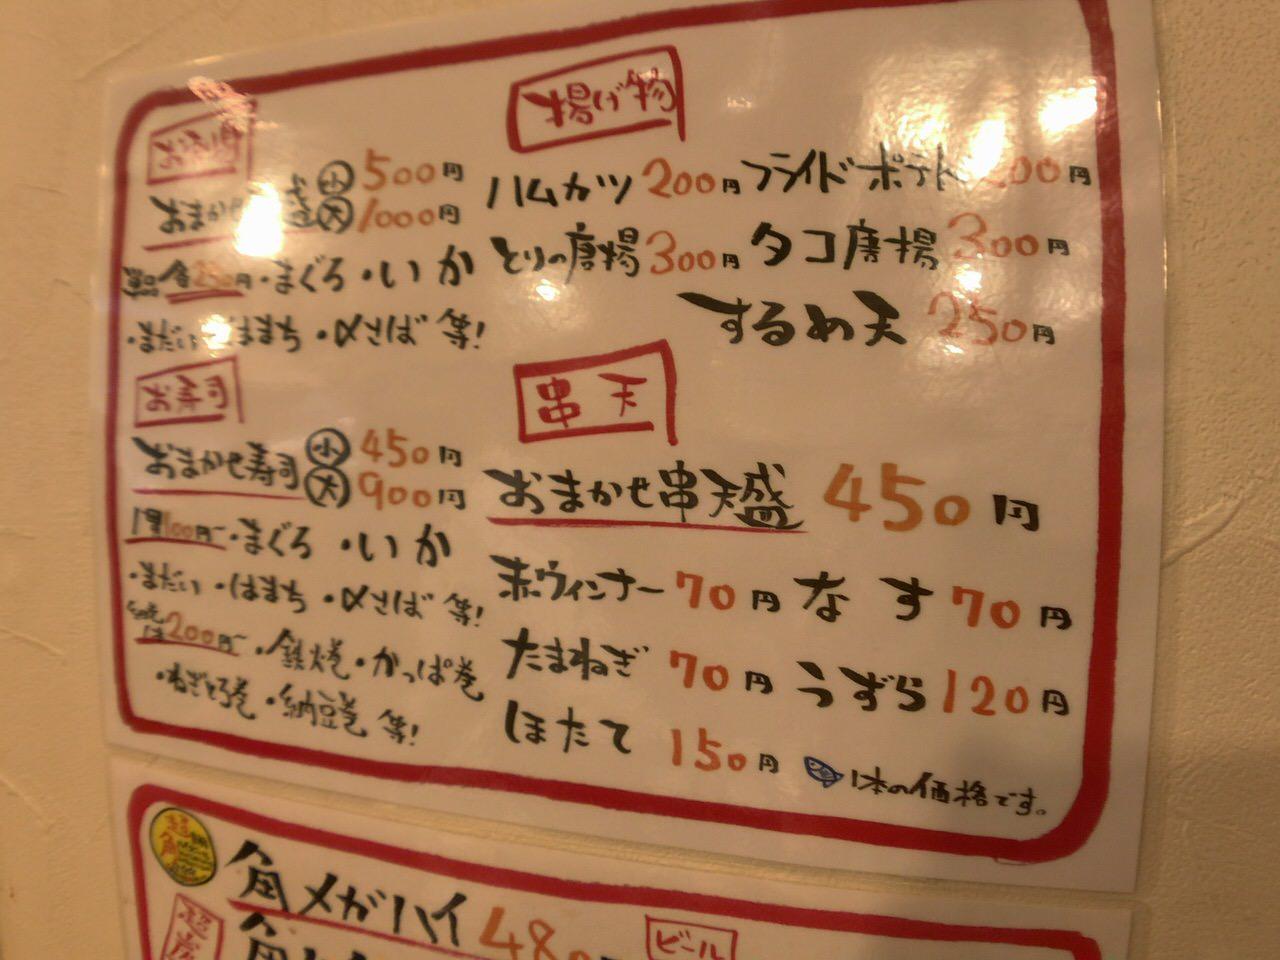 Nagimaru IMG 3336